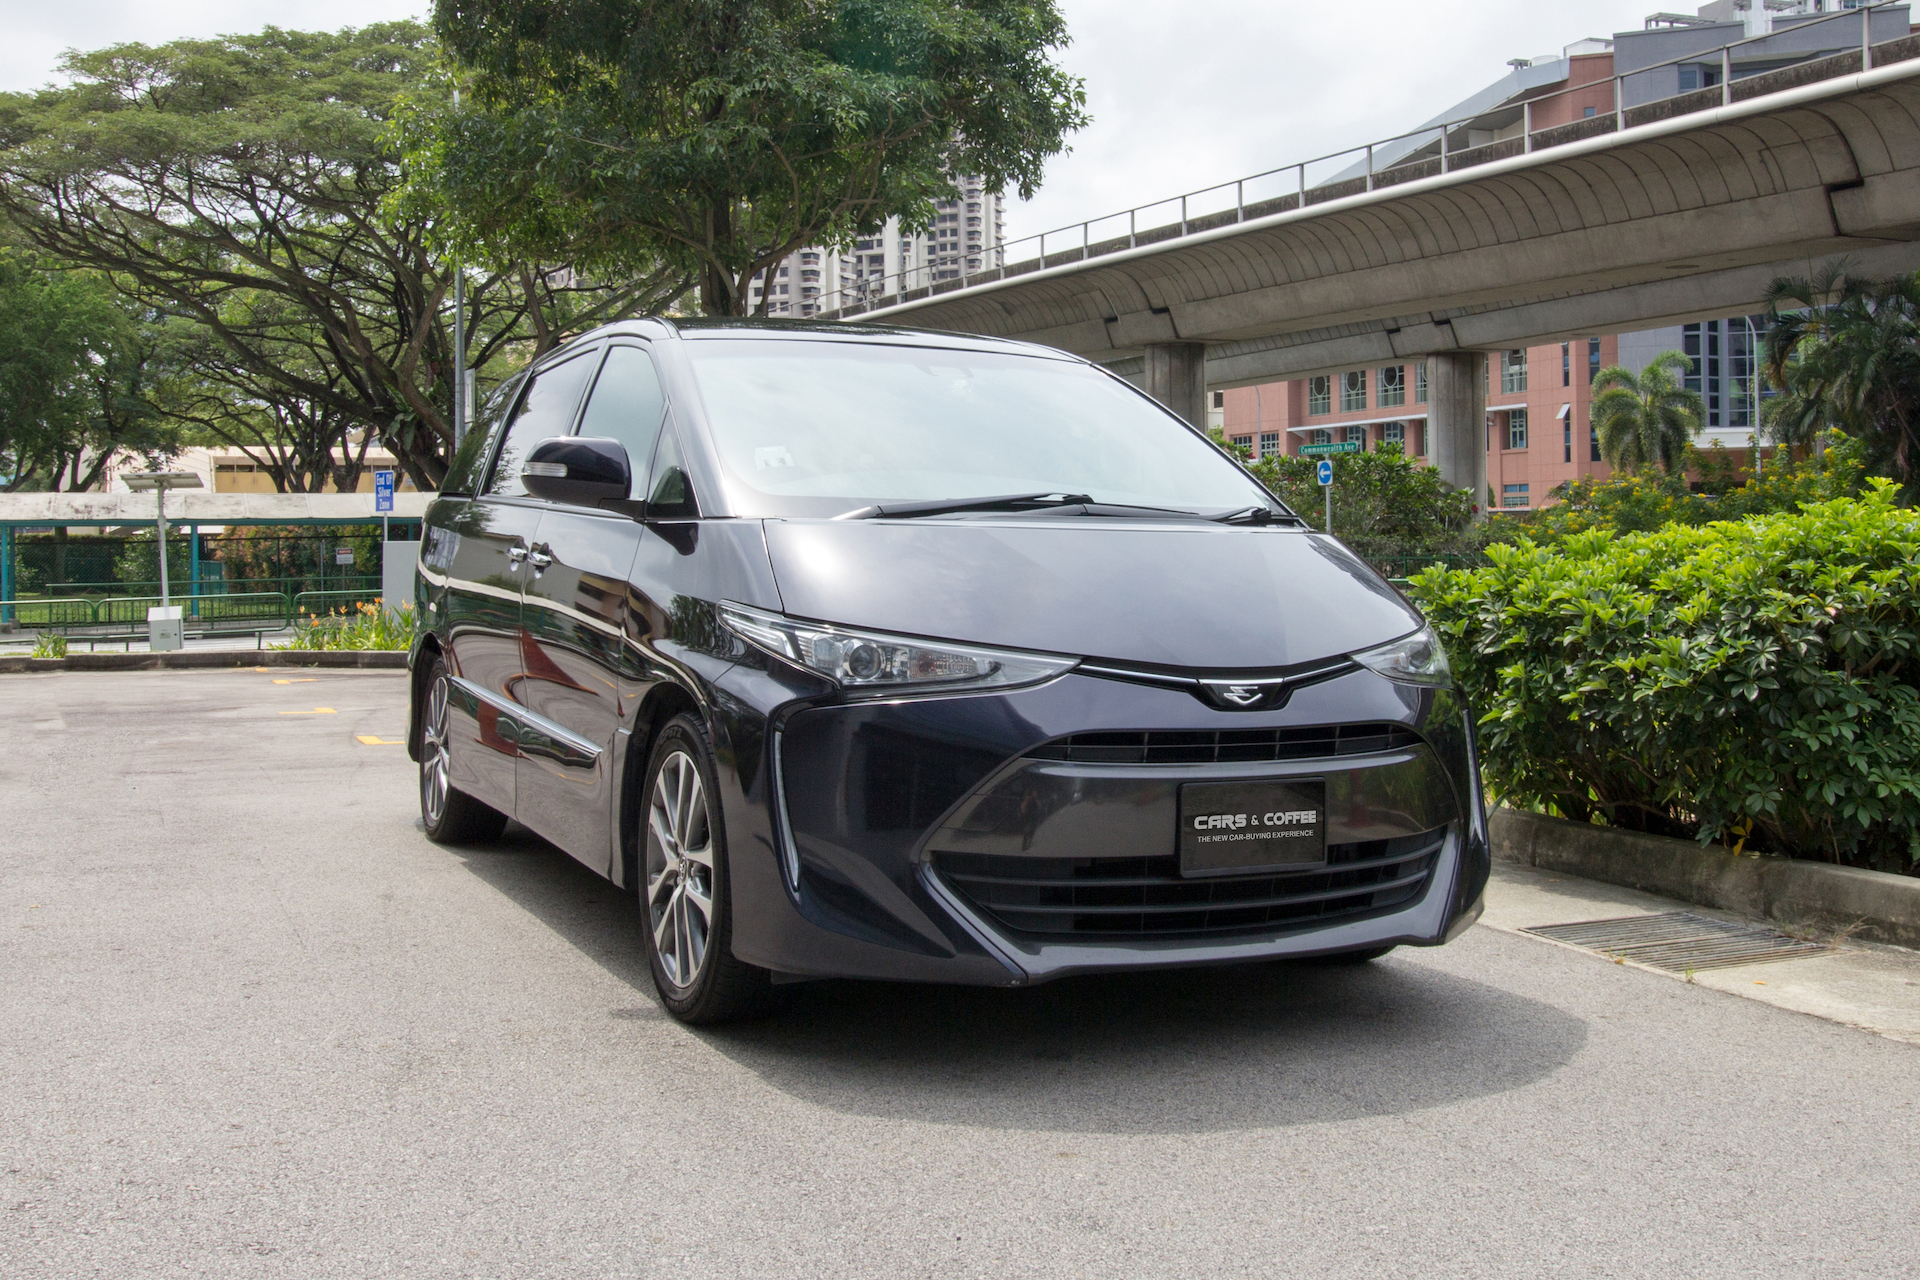 Certified Pre-Owned Toyota Estima Aeras Premium | Cars and Coffee Singapore